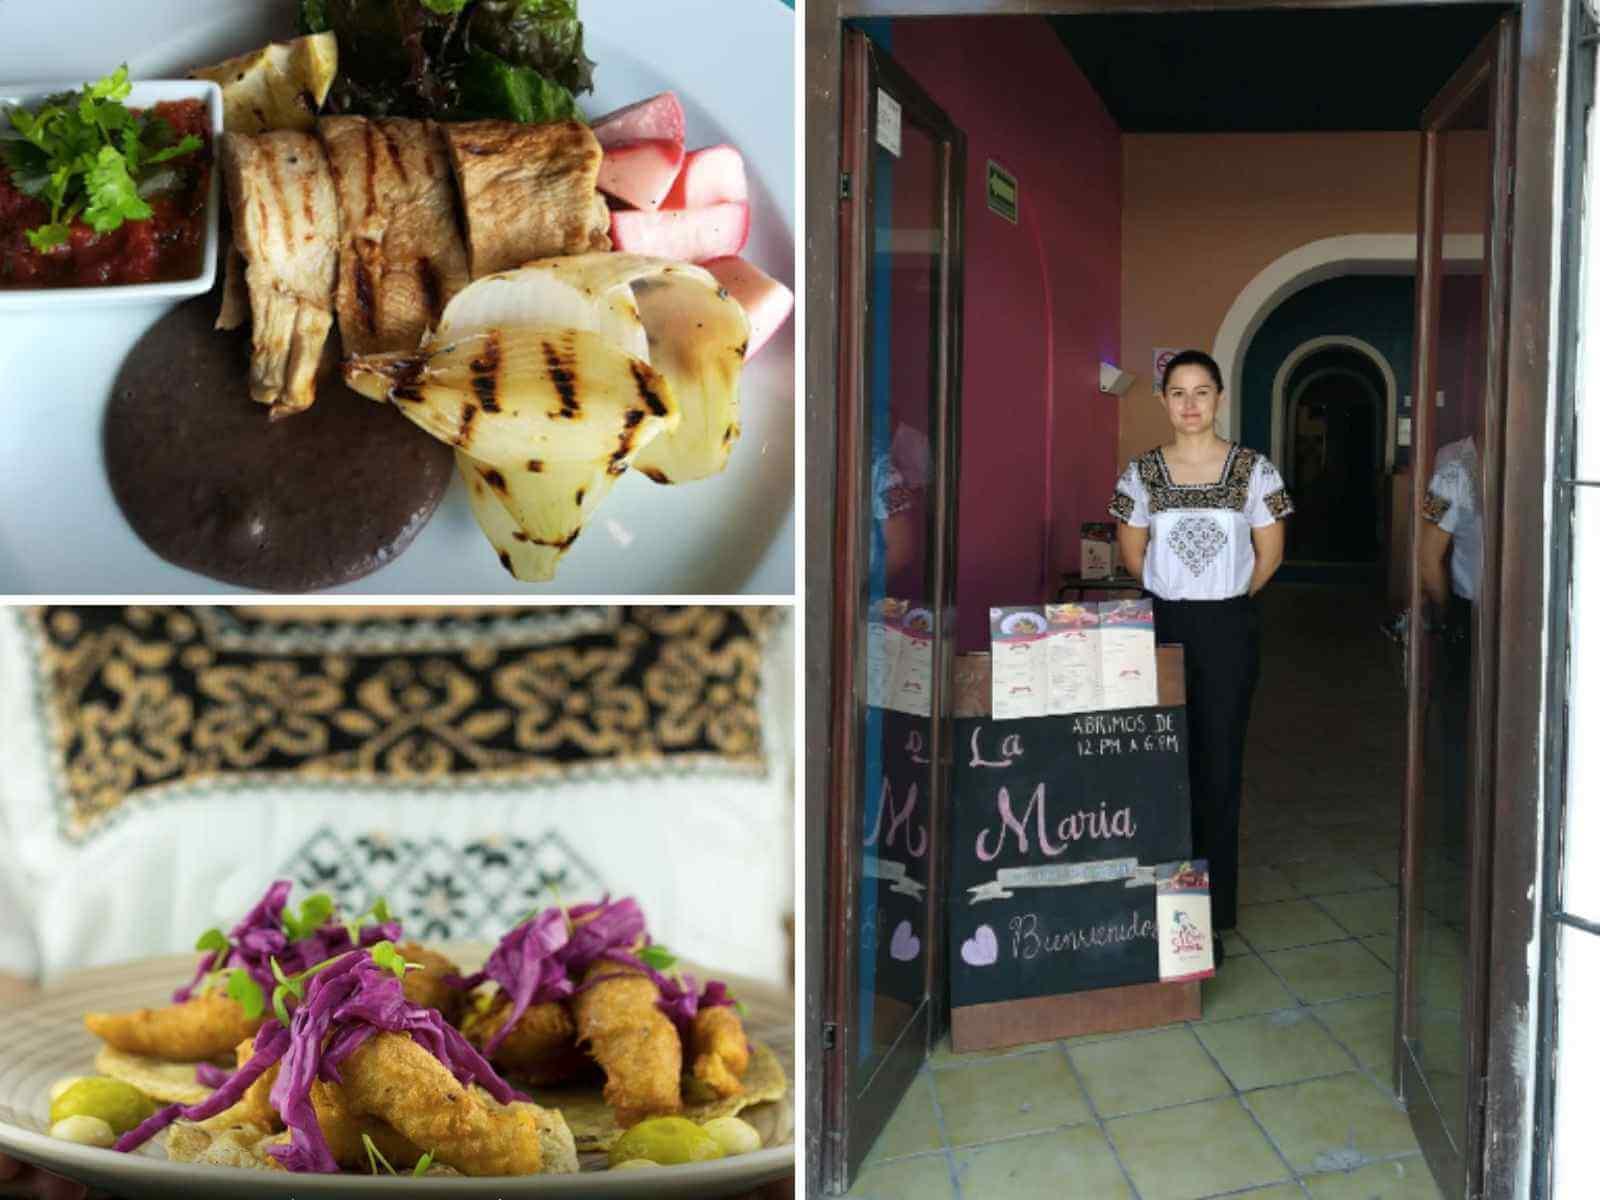 Restaurant Campeche - La Maria Cocina Peninsular